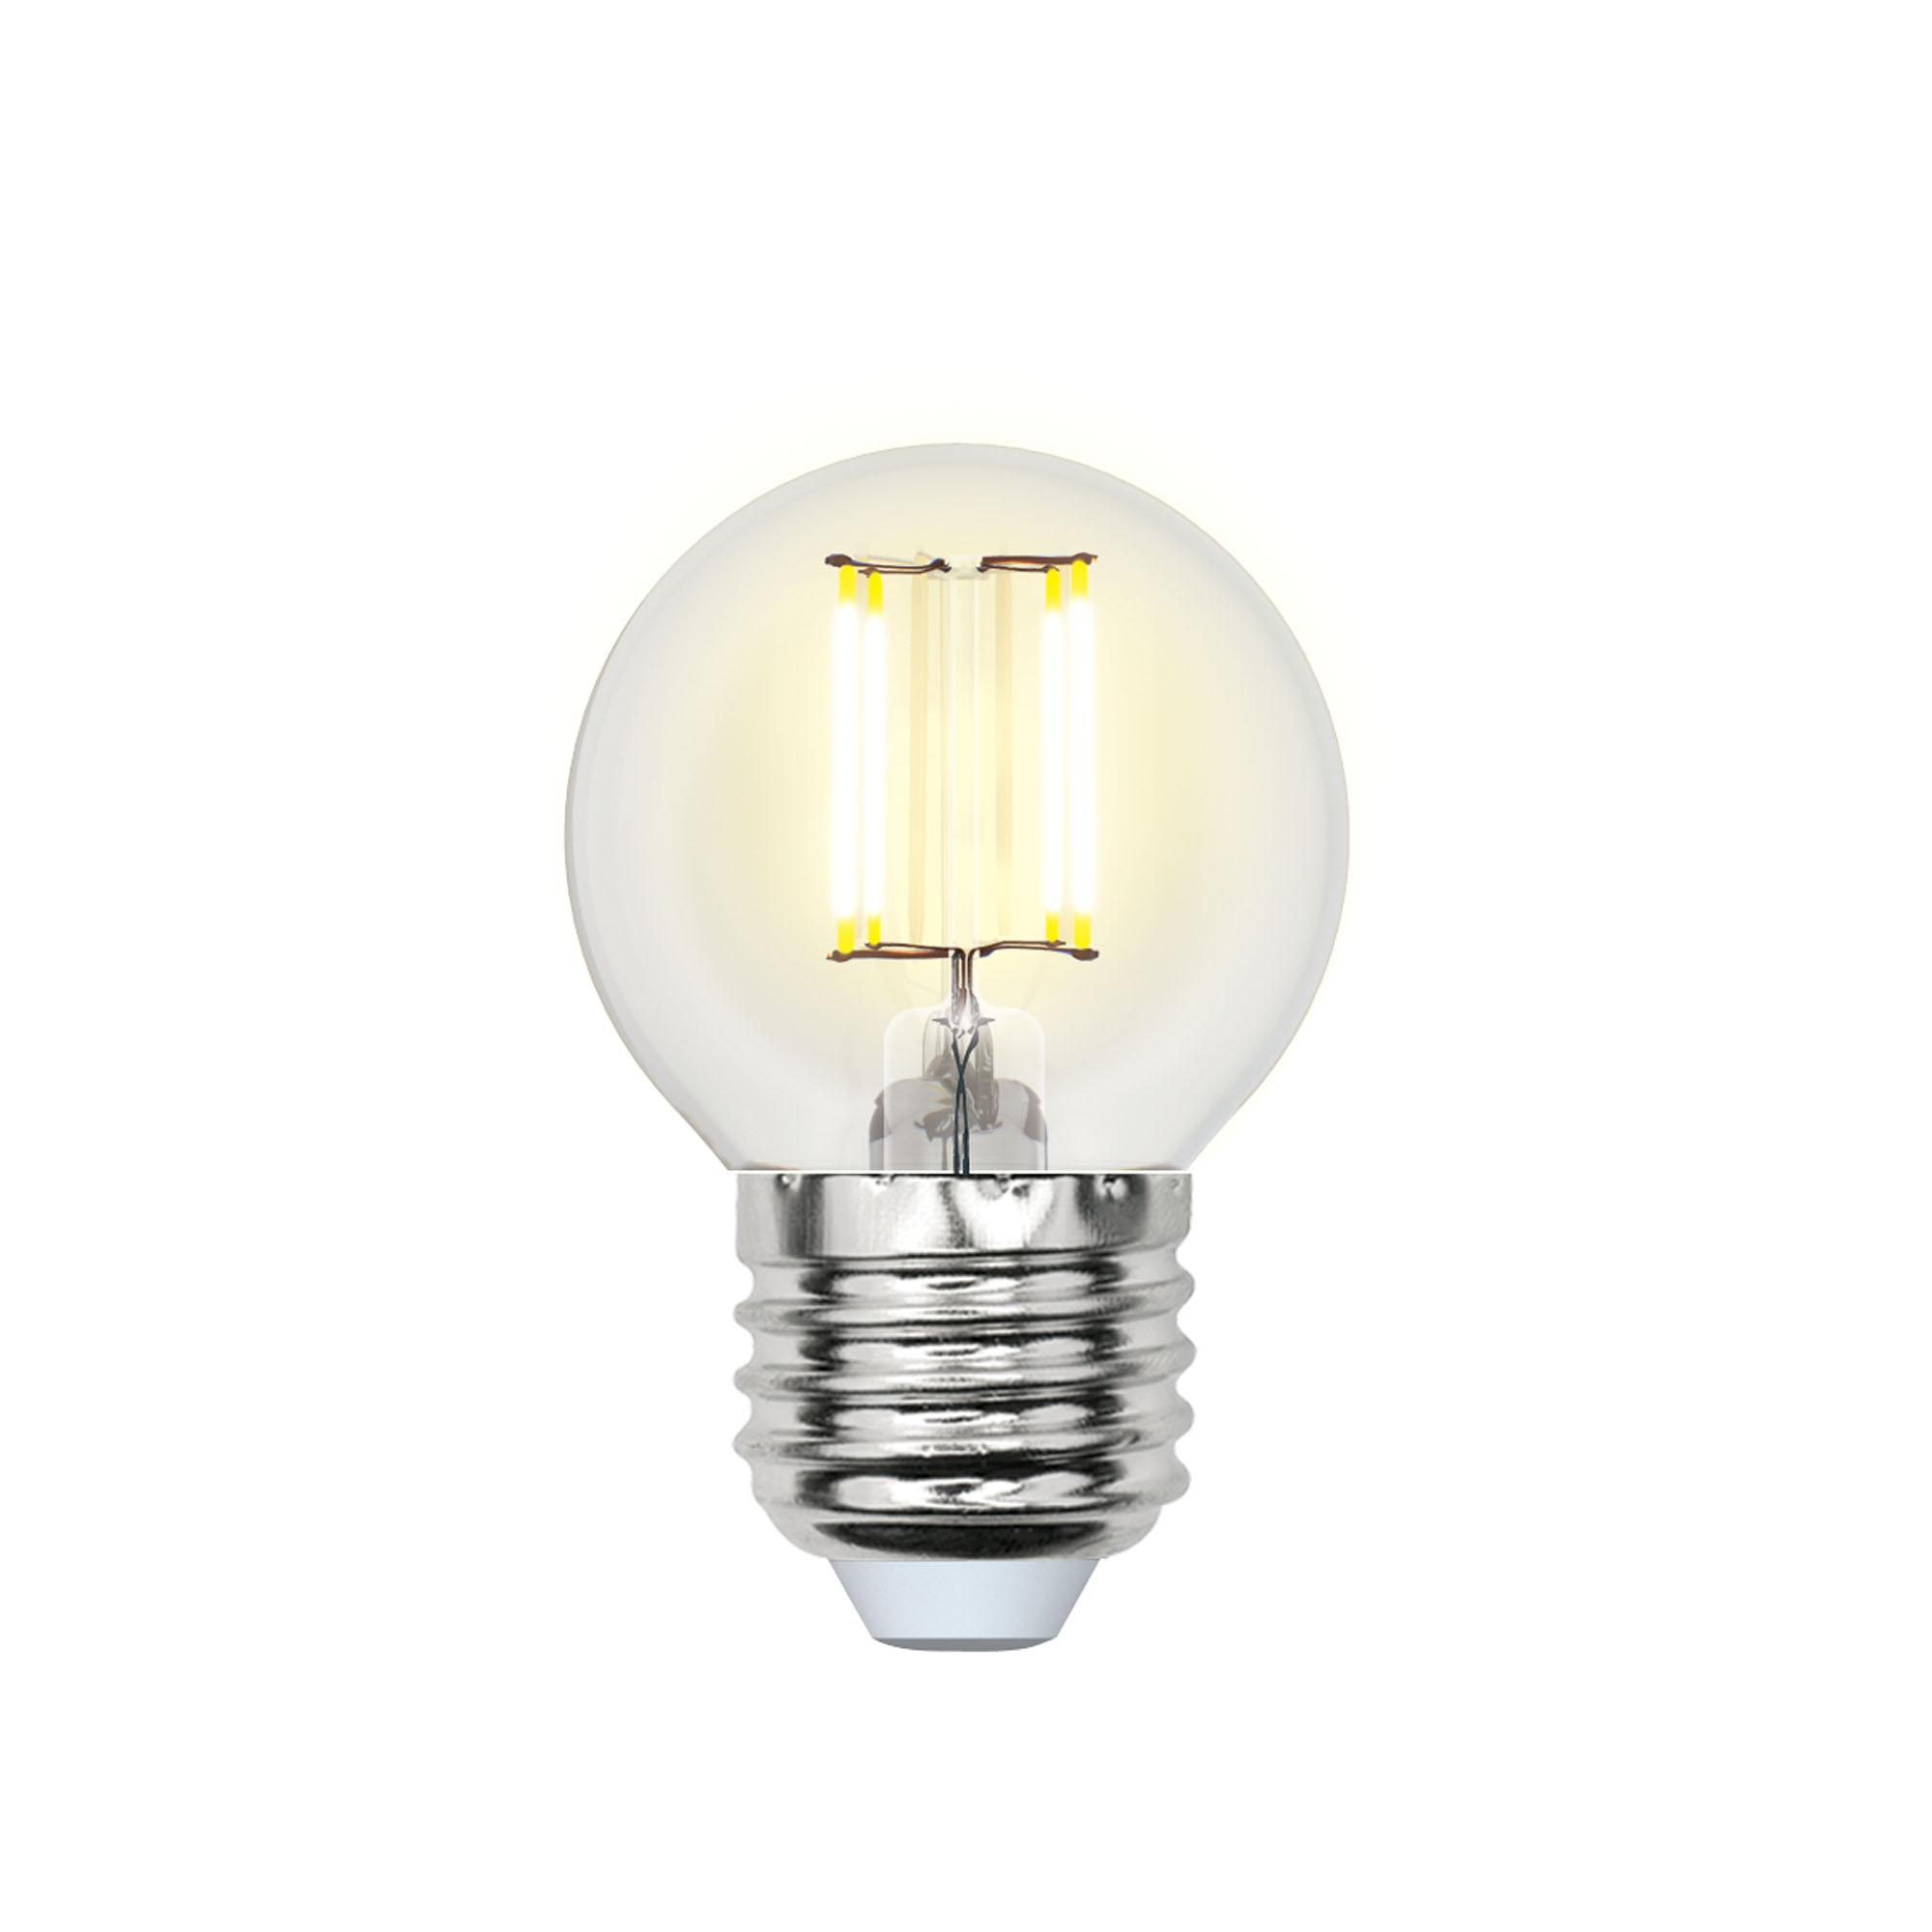 Лампа светодиодная Uniel Led-g45-6w/ww/e27/cl pls02wh 10шт